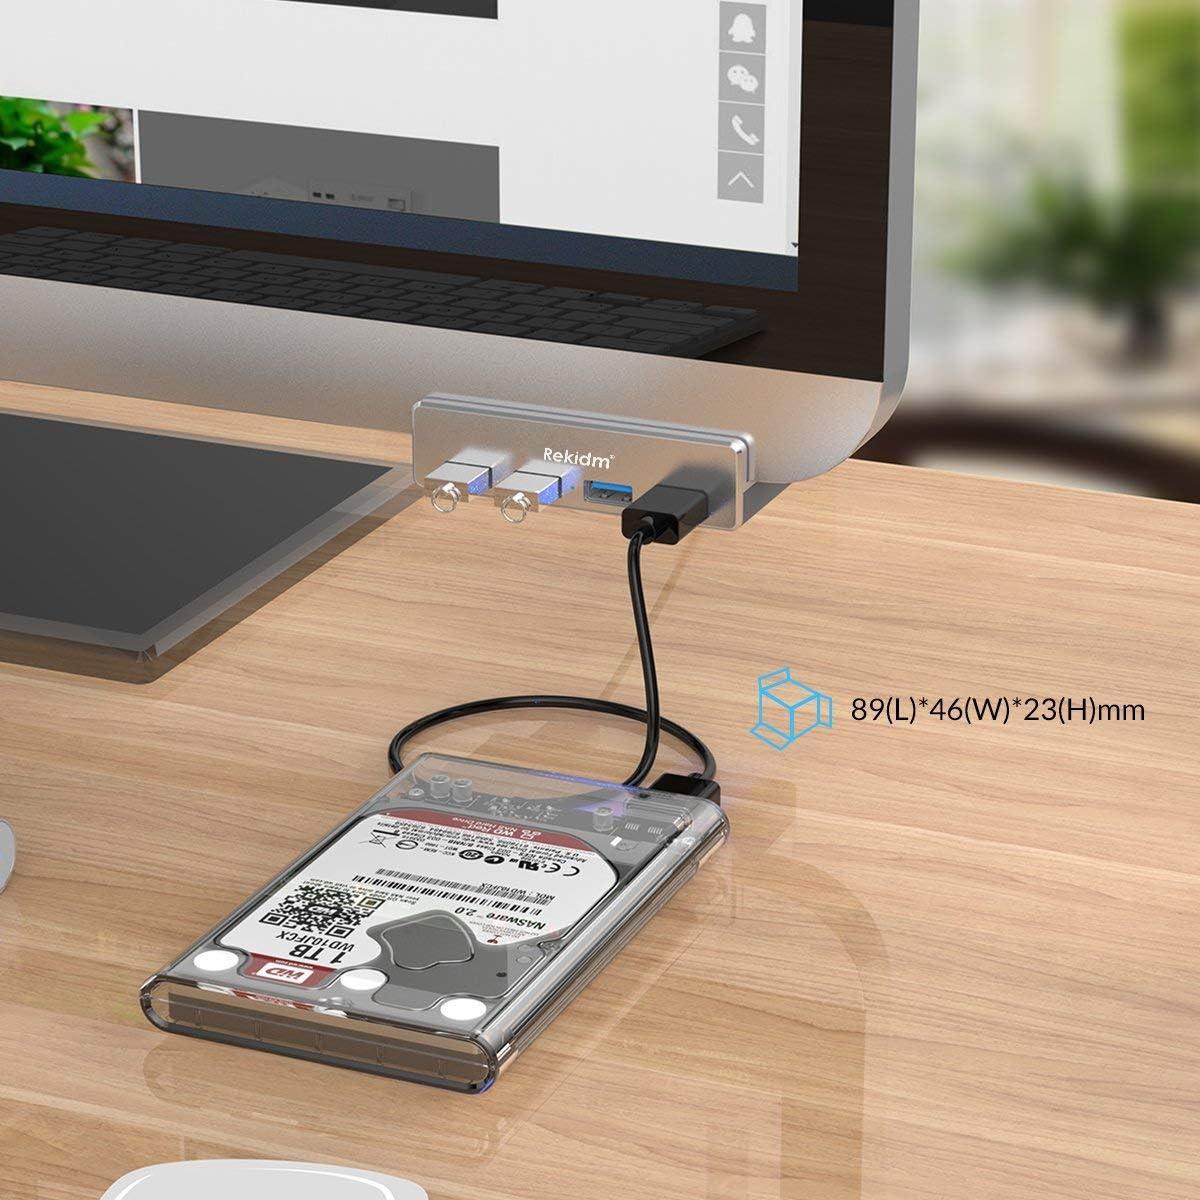 USB Hub 3.0 Table Edge with Durable Adjustable Clip Silver Compact Space-Saving Mountable USB Hub Fast Speed Transfer Computer Rekidm 4 Port Aluminum USB 3.0 Hub Clamp Design for Desktop PC